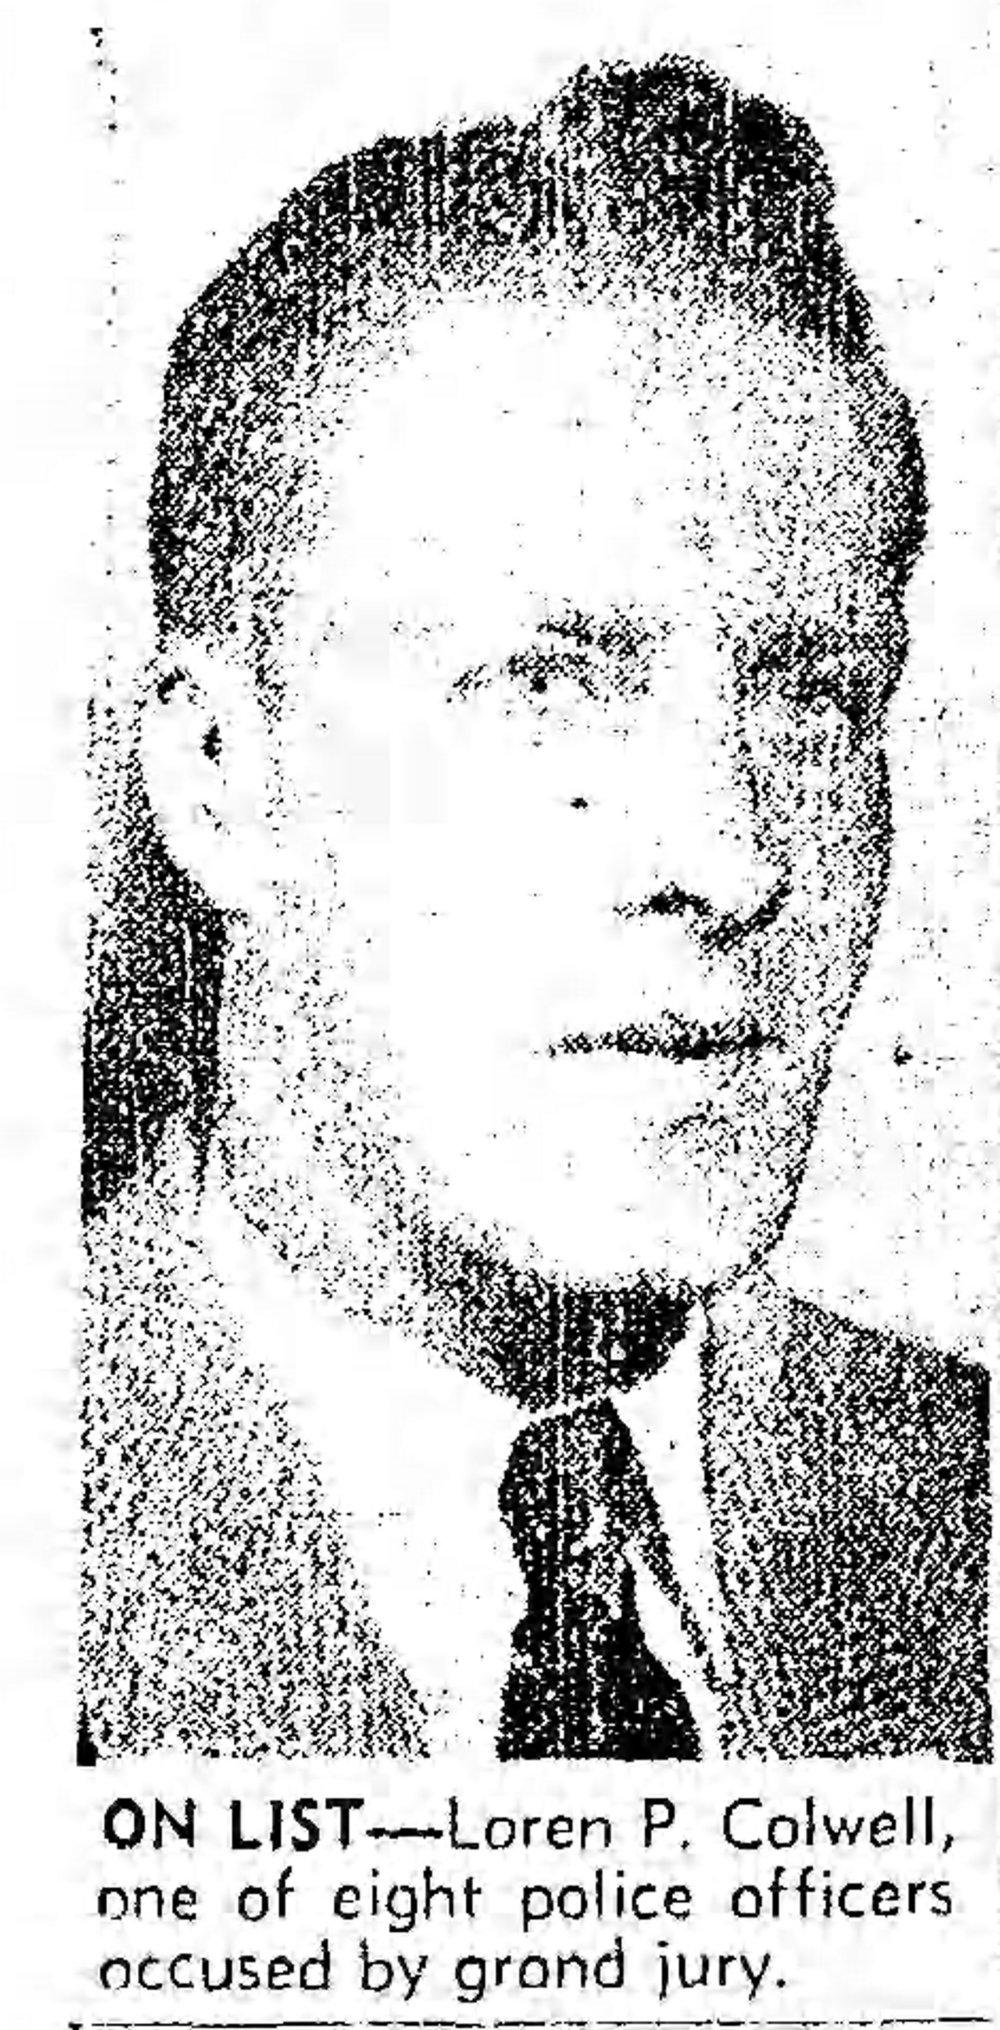 The_Los_Angeles_Times_Wed__Apr_23__1952_(4).jpg